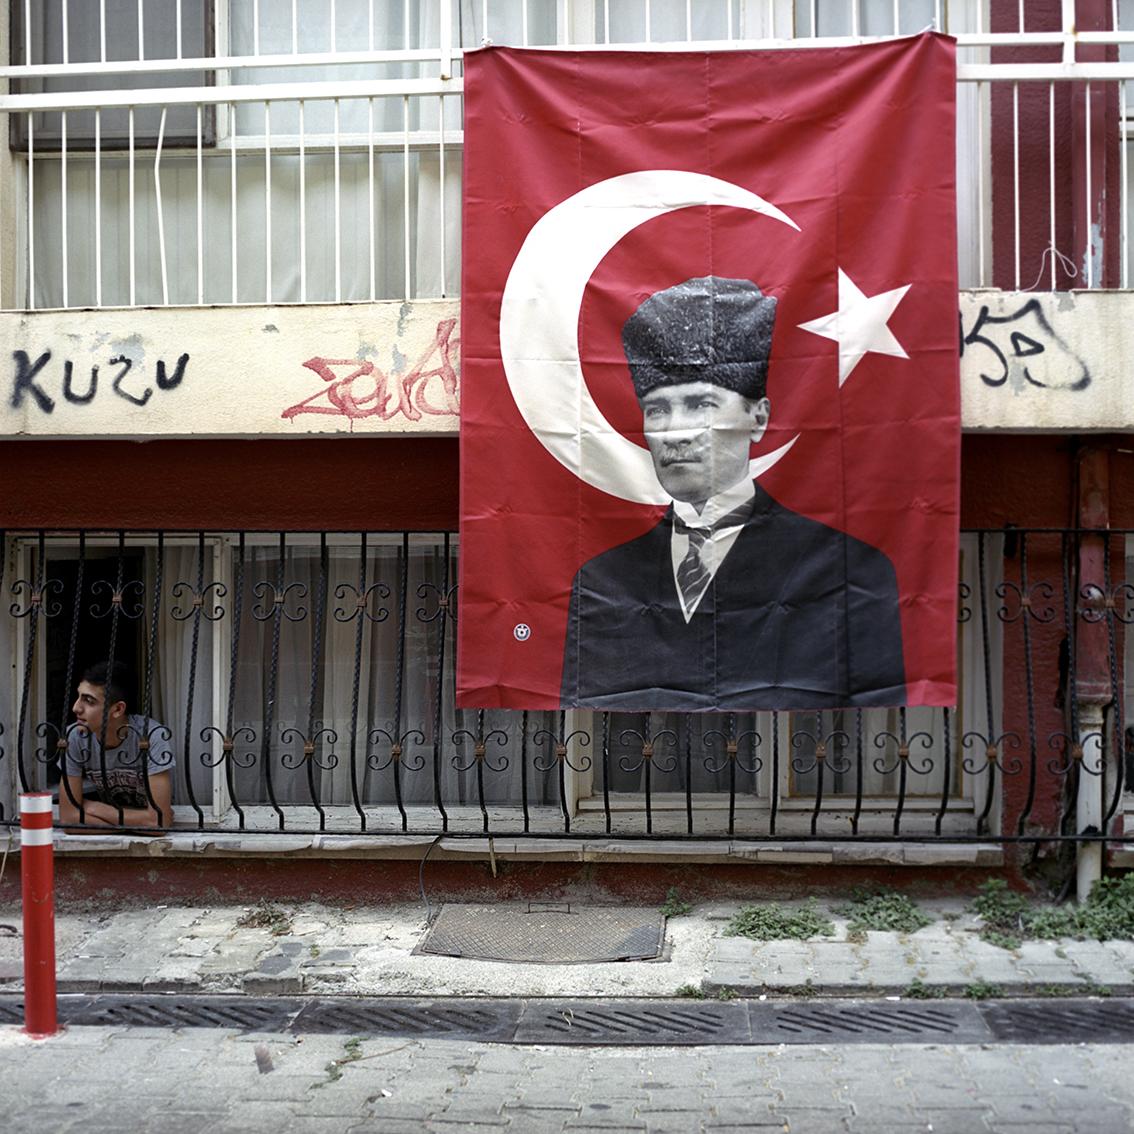 Ataturk in Izmir, Turkey